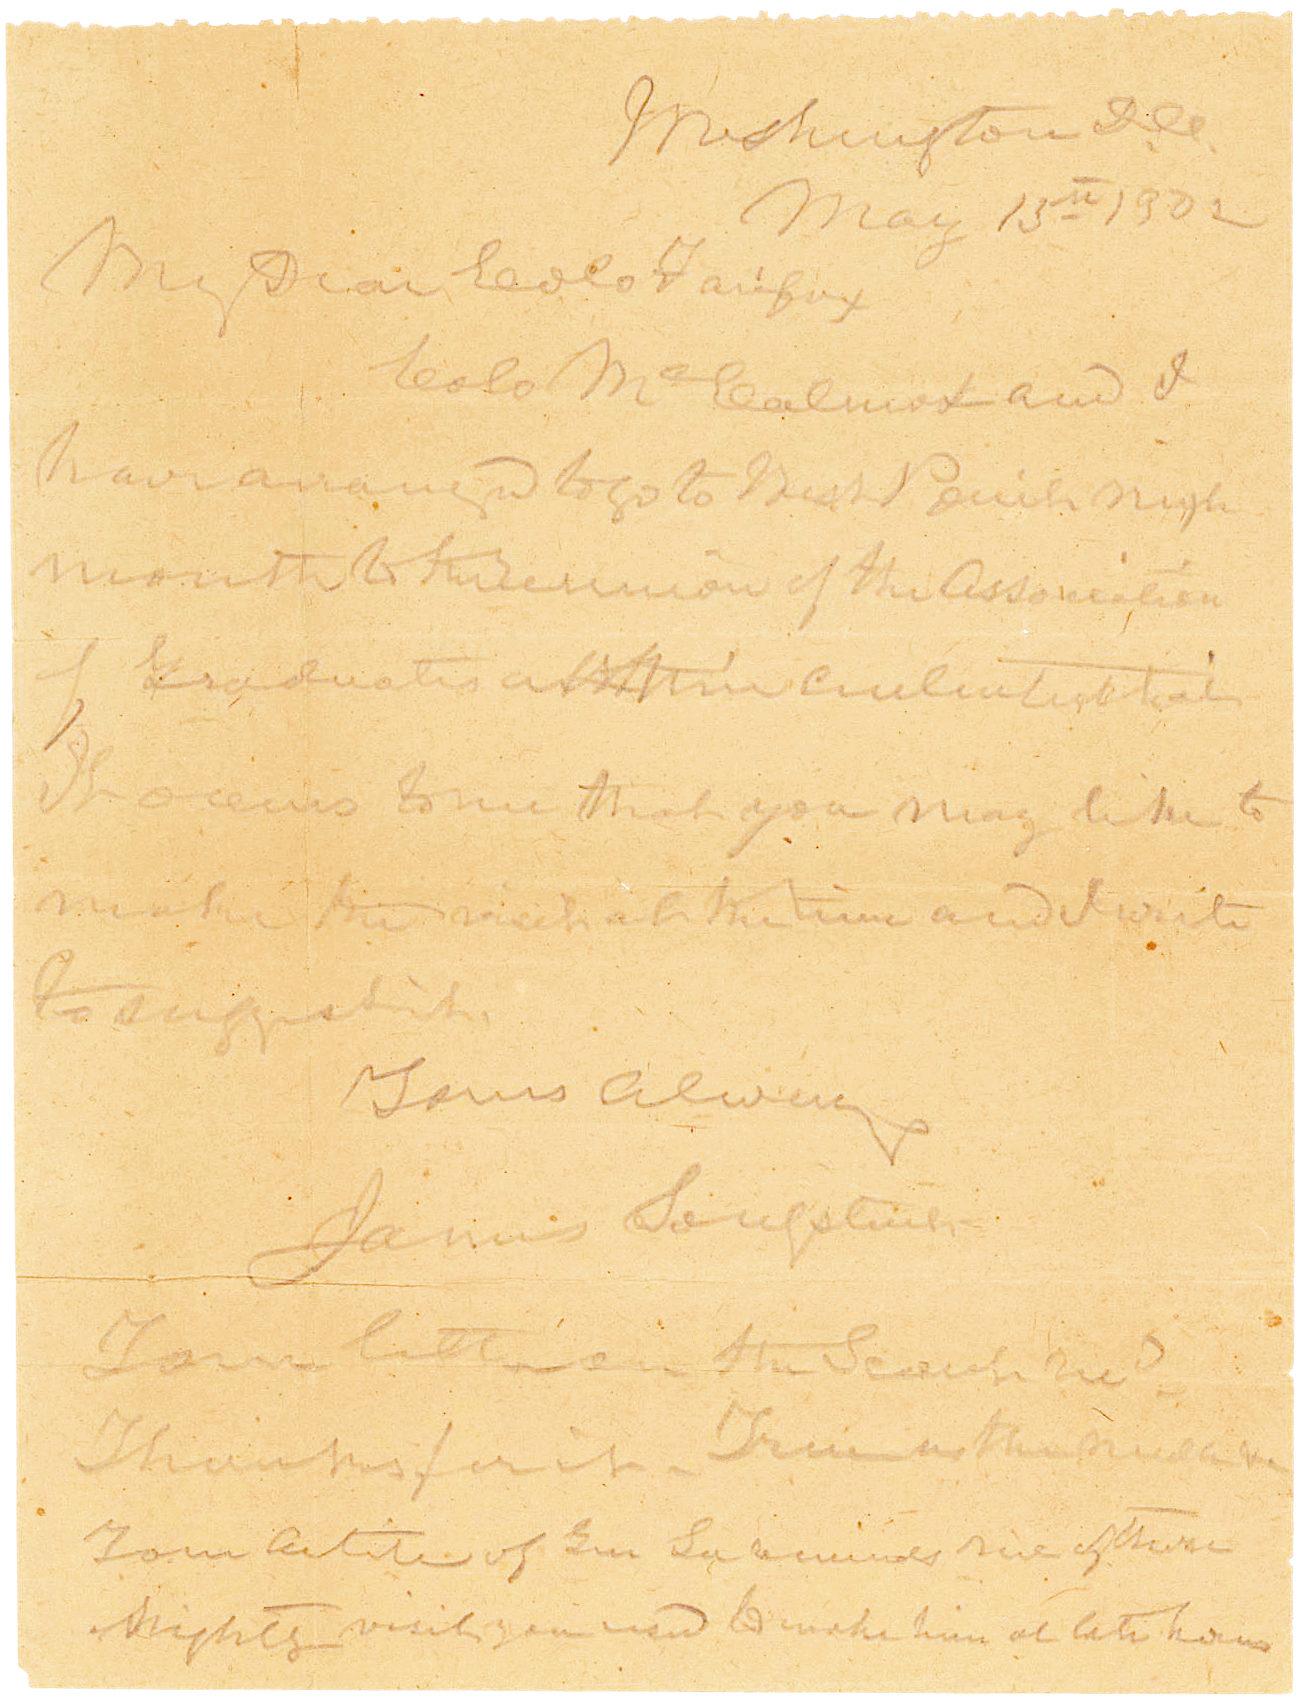 ALS Mentioning Robert E. Lee and West Point's Centennial